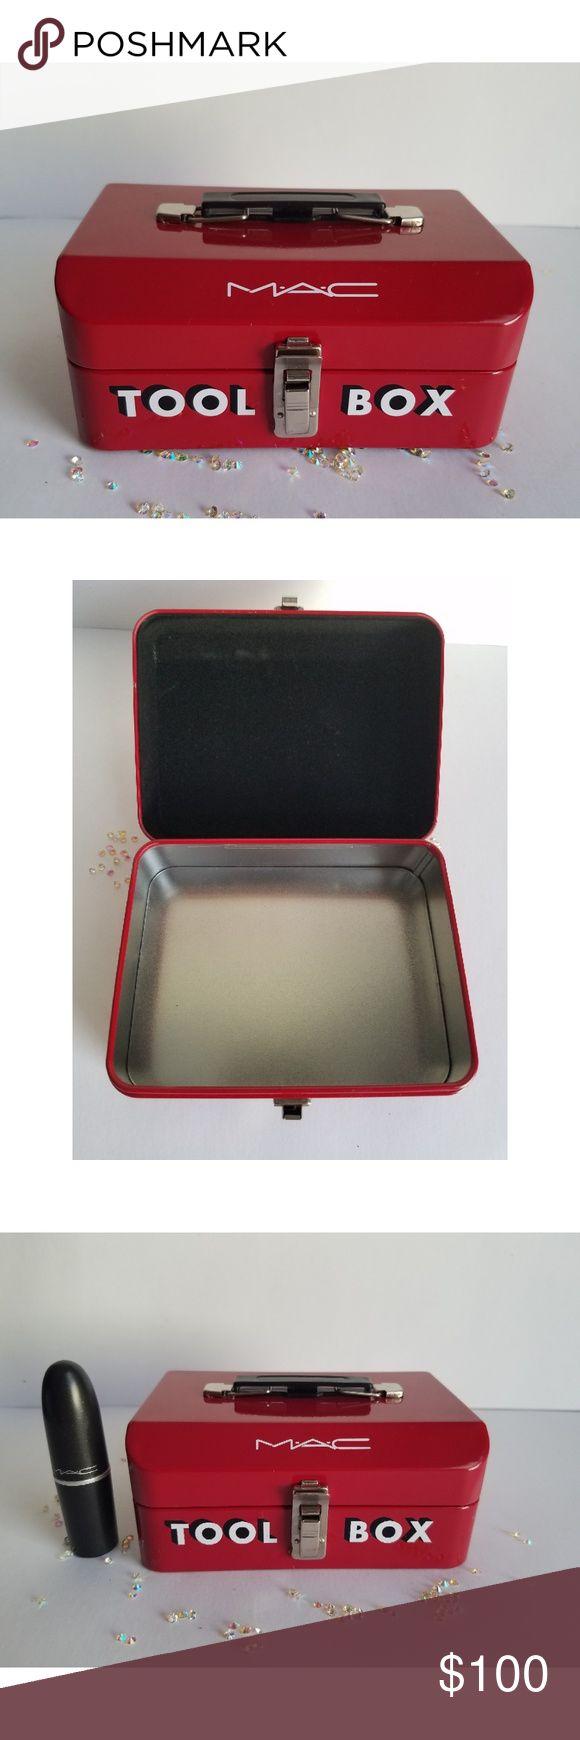 Mac Cosmetics Tool Box From The Mac Cafe Workshop Mac Cosmetics Tool Box From Th…